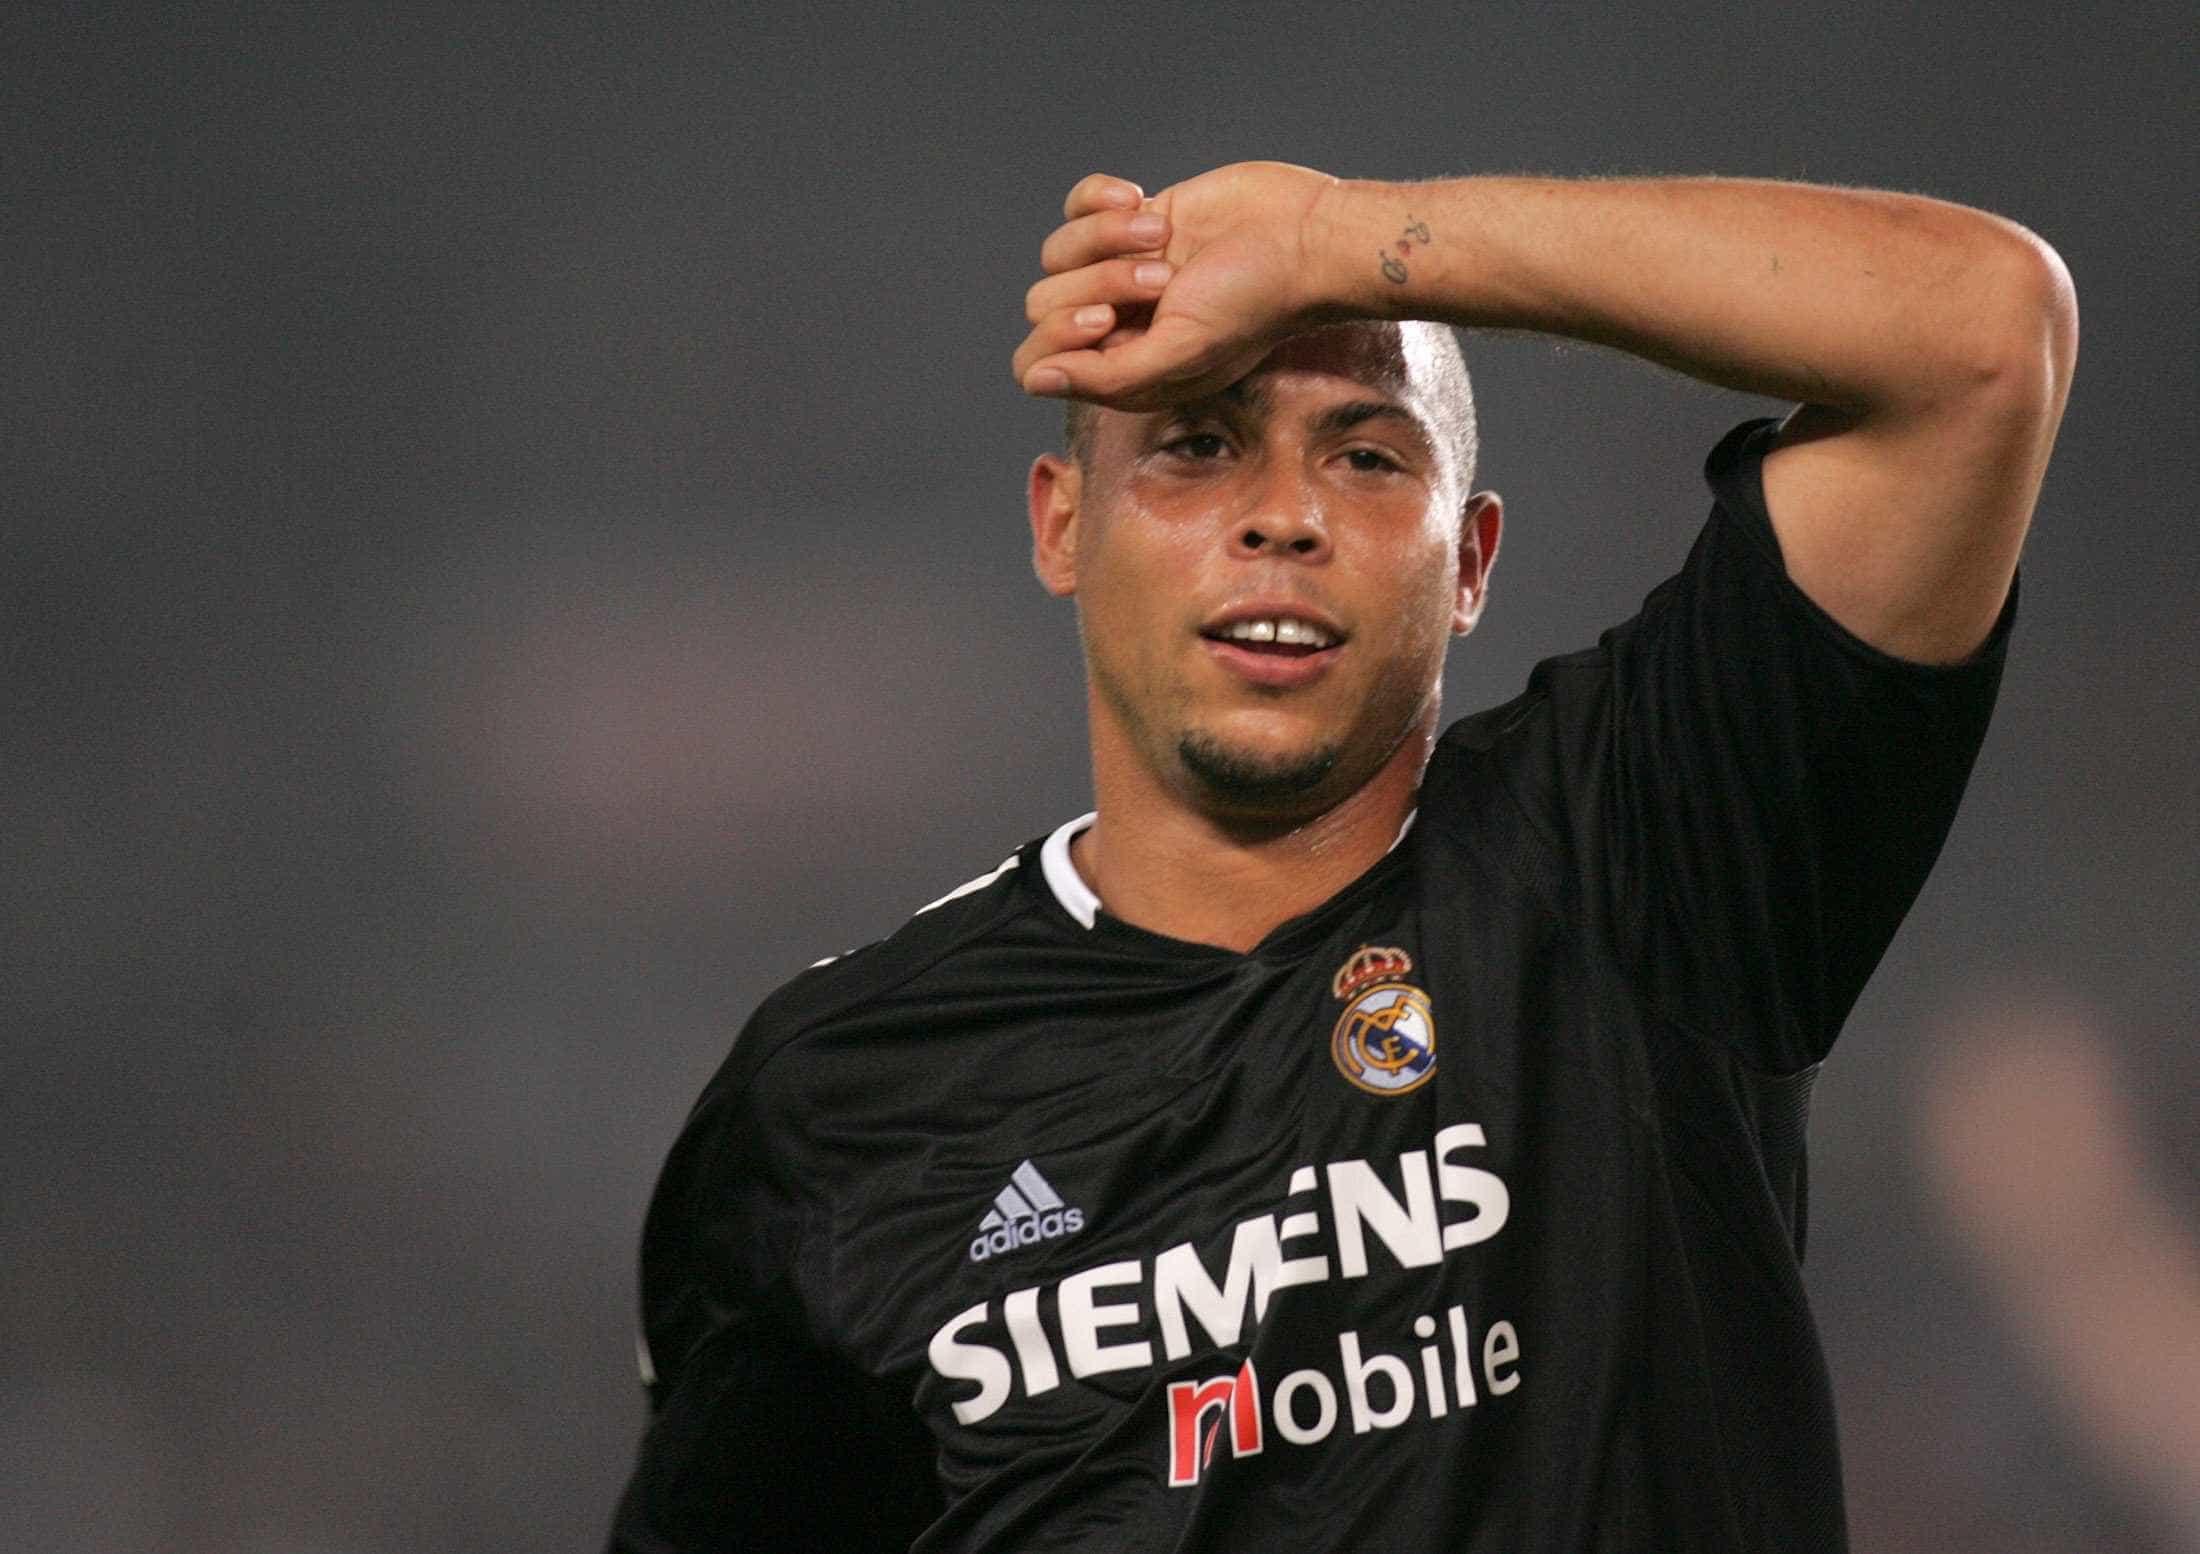 Ronaldo deu resposta 'fenomenal' a presidente do Real após bronca -